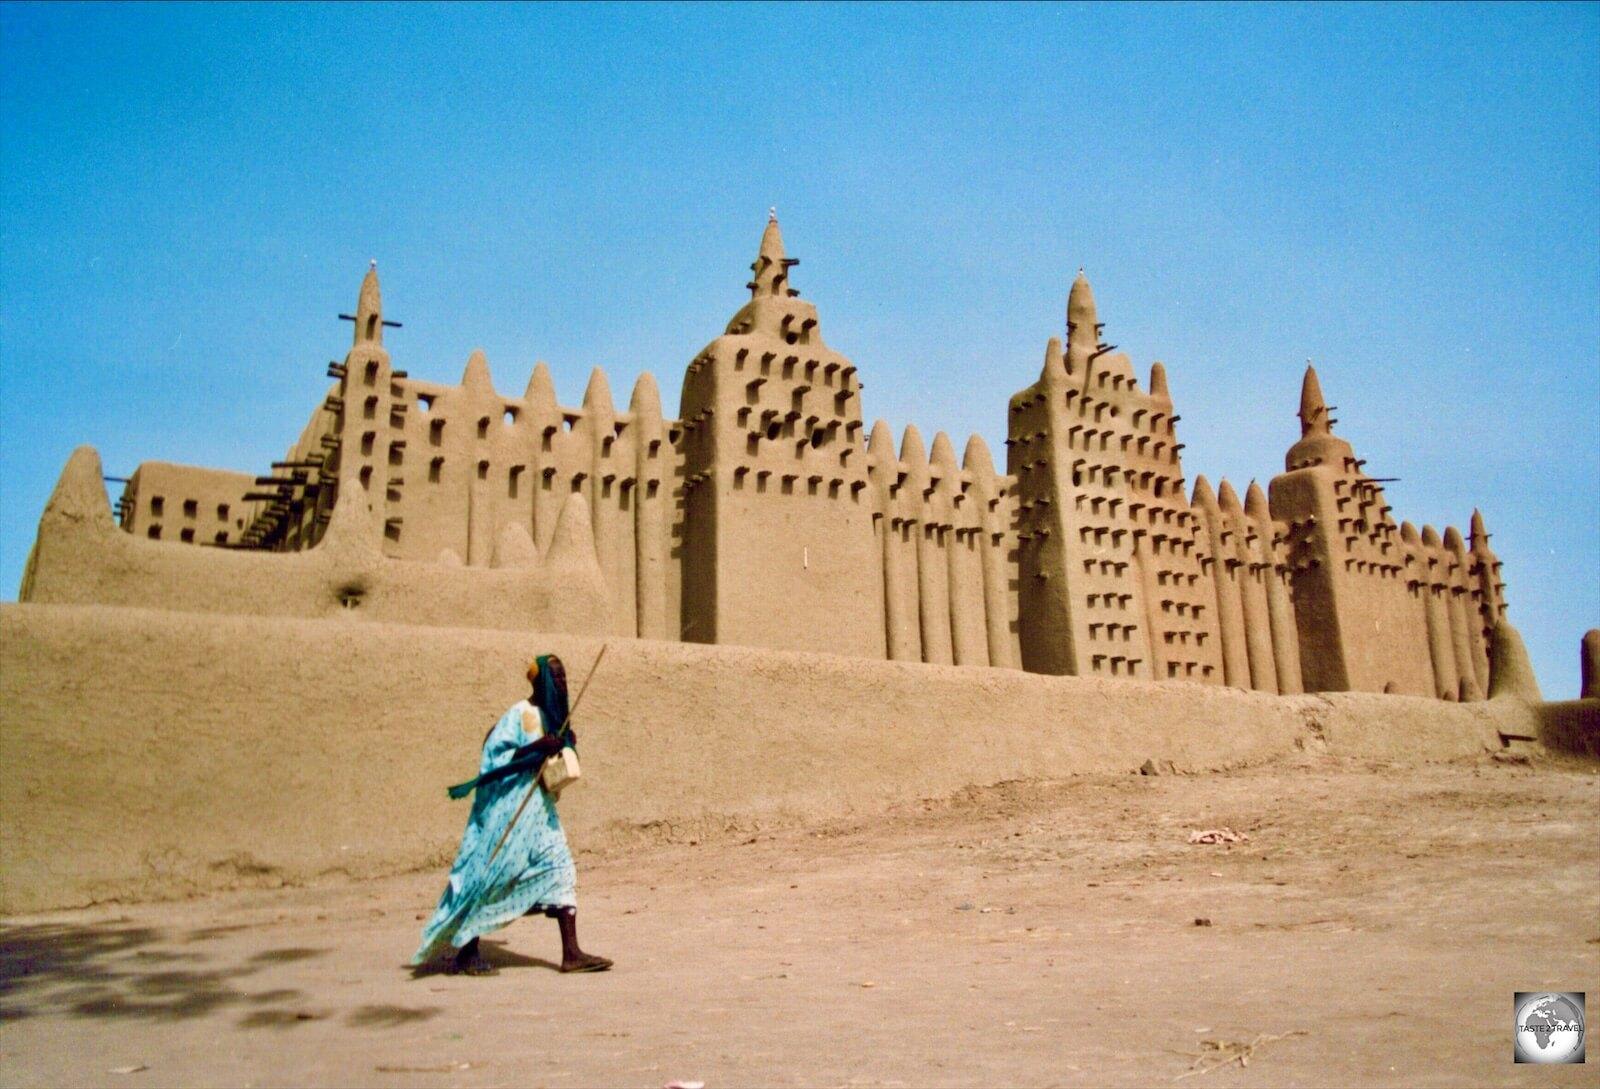 Mali: Mosque of Djenne